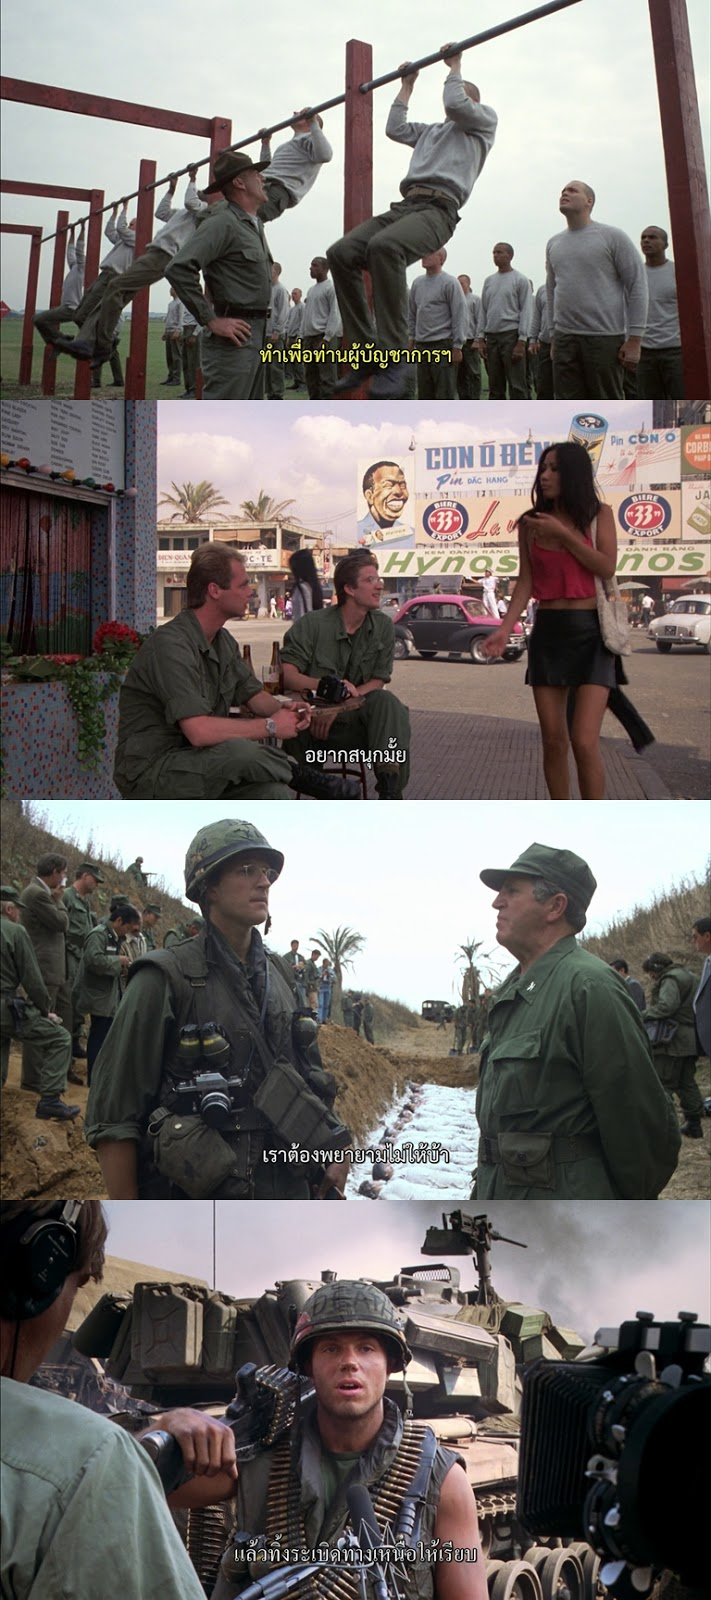 [MINI-HD] FULL METAL JACKET (1987) เกิดเพื่อฆ่า [1080P] [เสียงไทยมาสเตอร์ 5.1 + ENG 5.1] [บรรยายไทย + อังกฤษ] ZAKKY-FFF